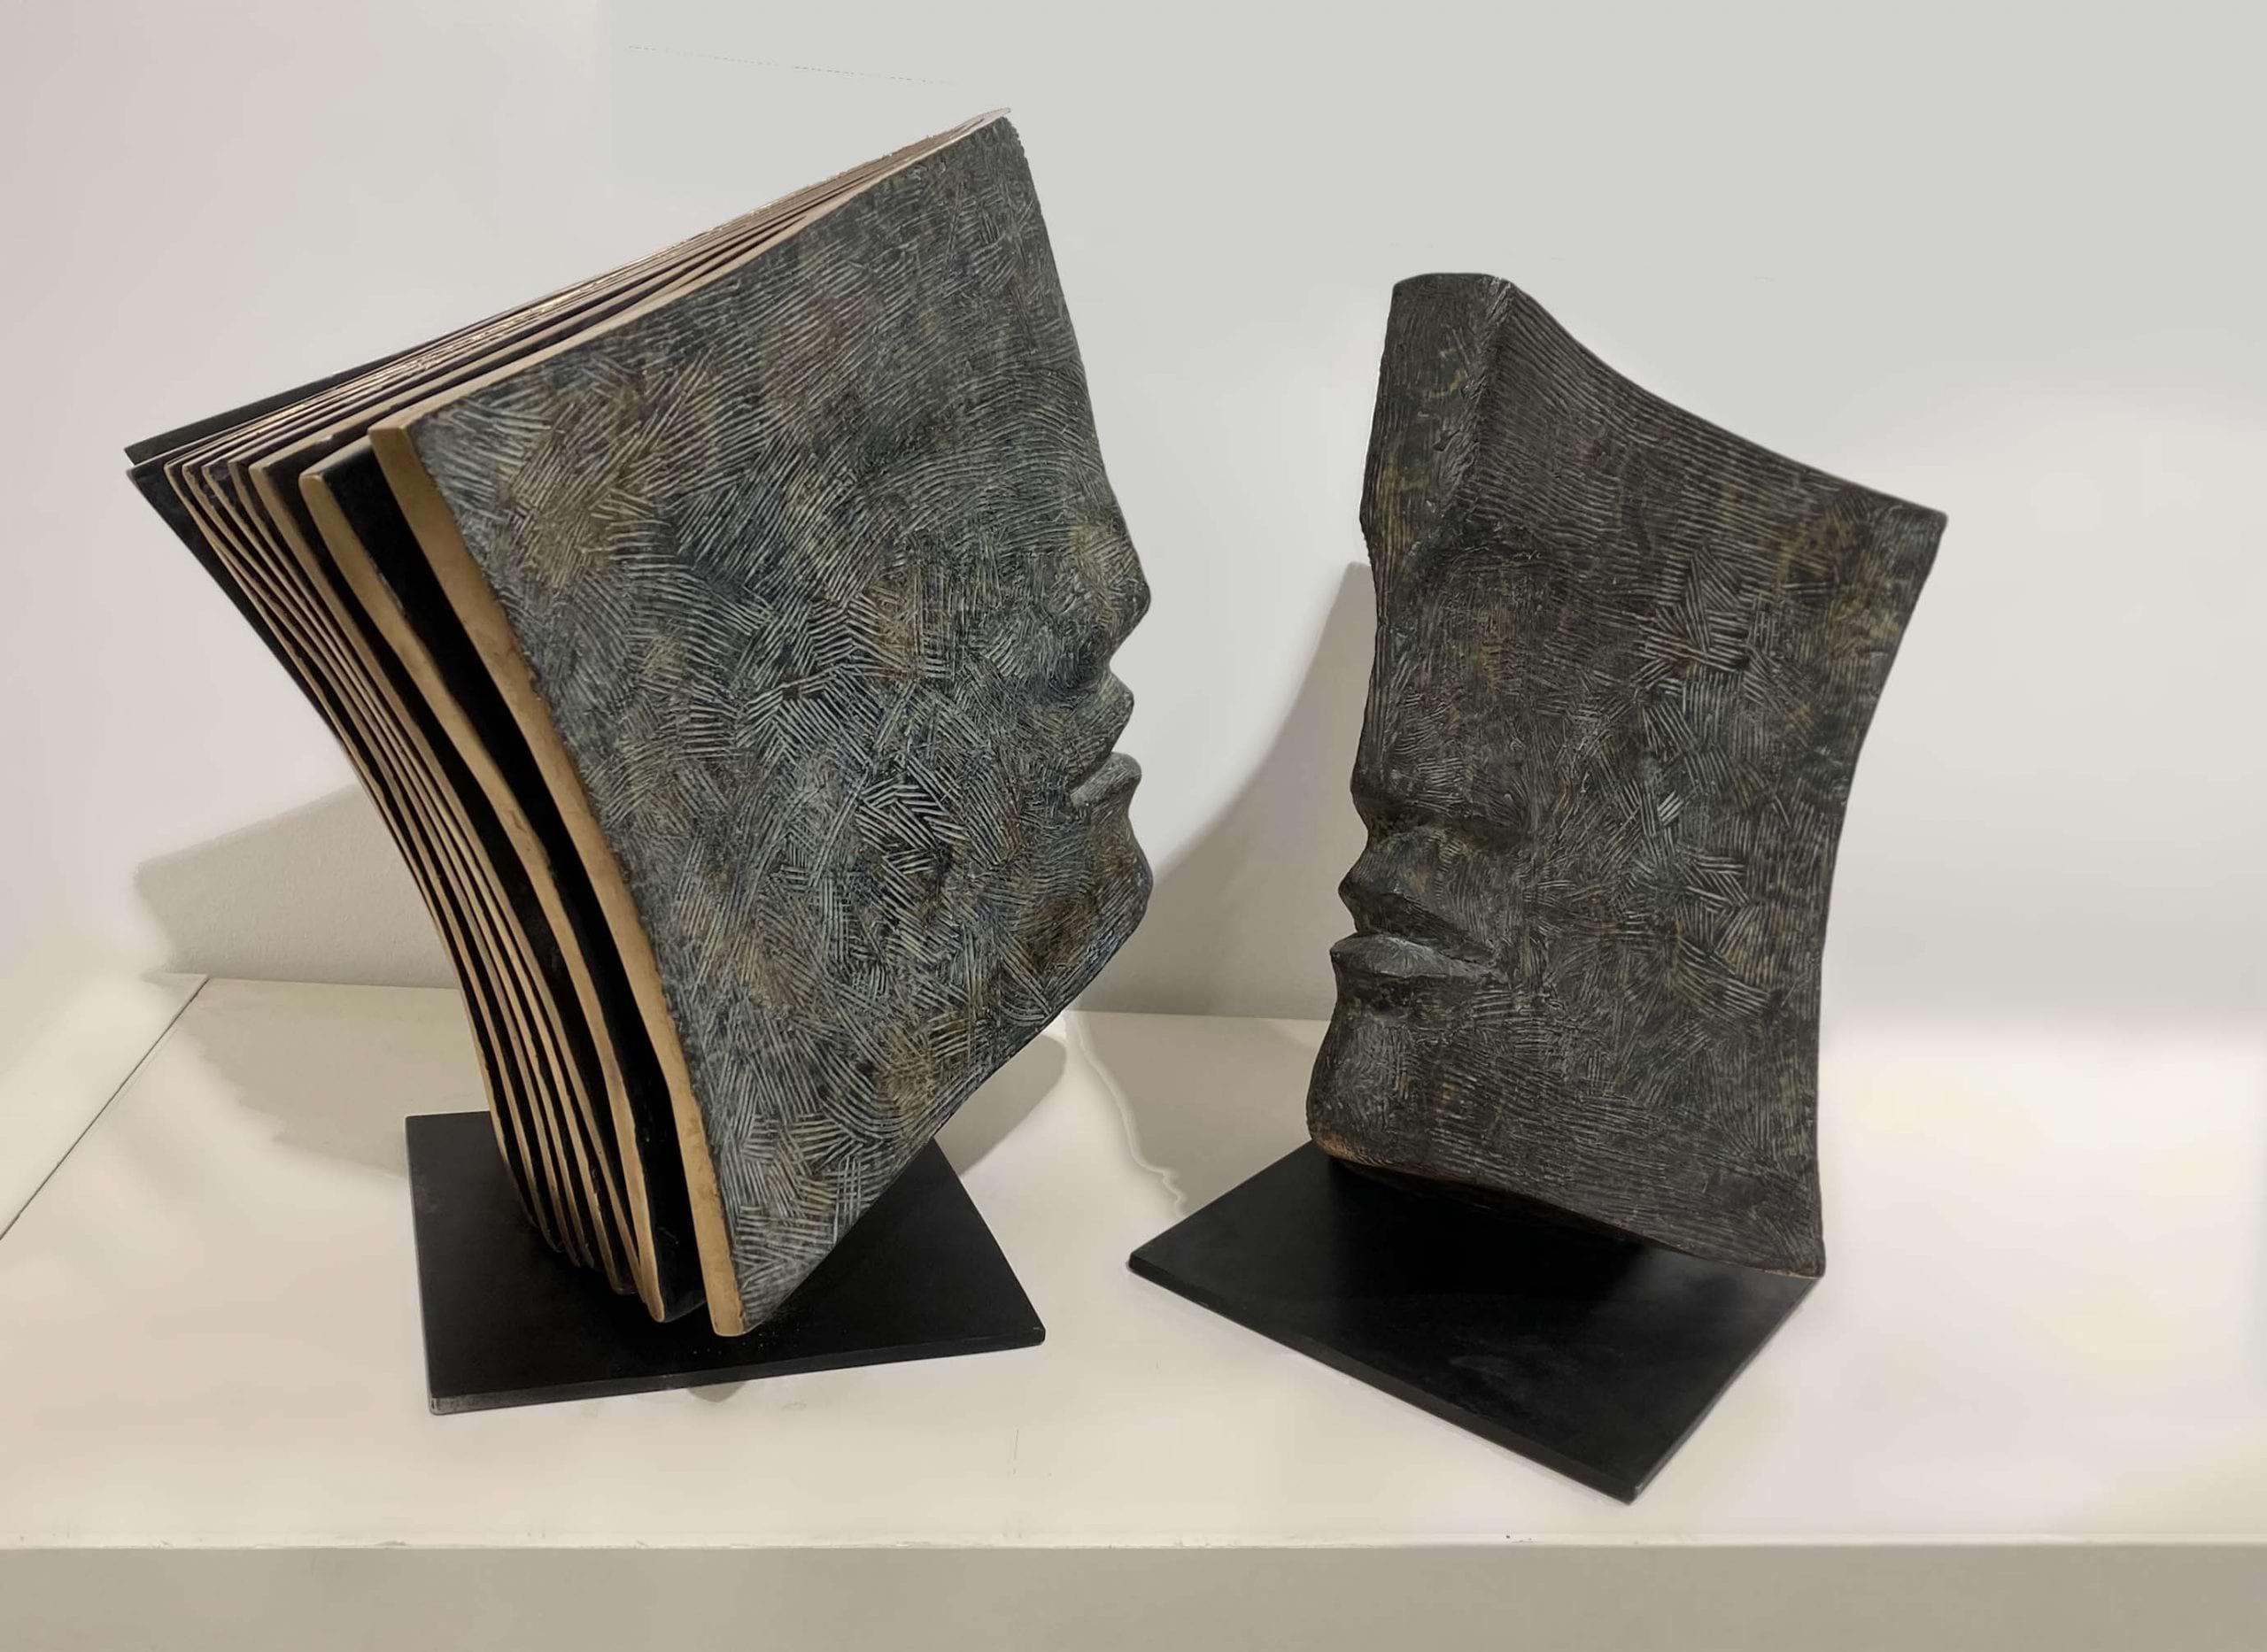 ÉPÎTRES Bronze 41x40x30 et 38x28x25cm / 16,1X15,7X11,8 & 14,9X11X9,8 inches